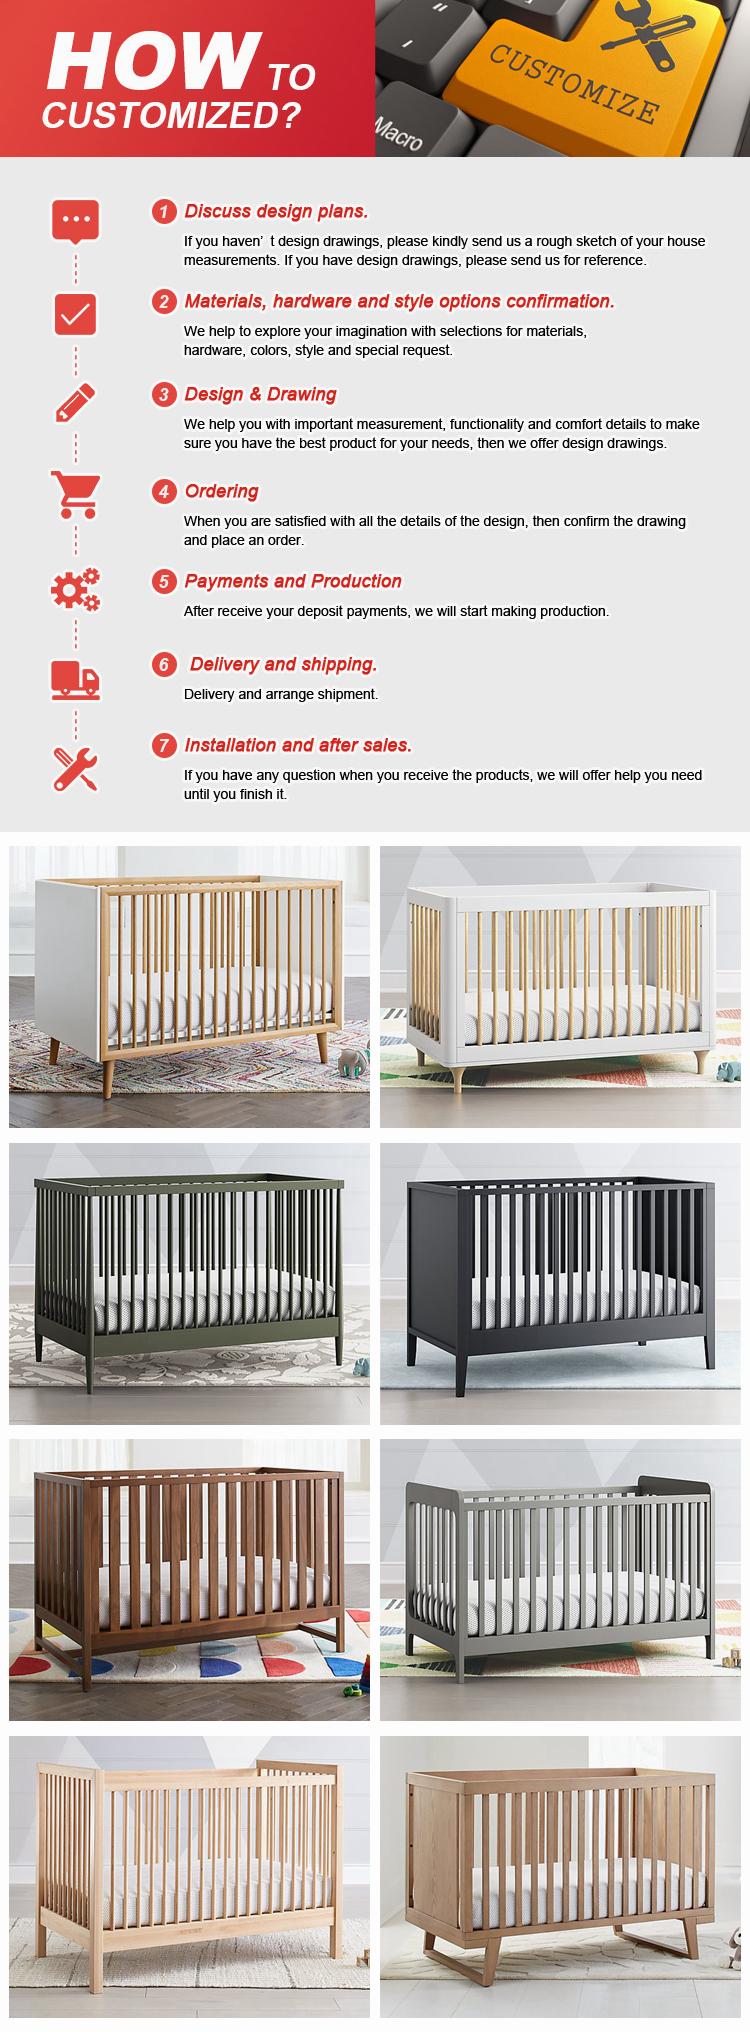 Factory direkten baby cots holz prinz kinderbett leander set mit großhandel preis